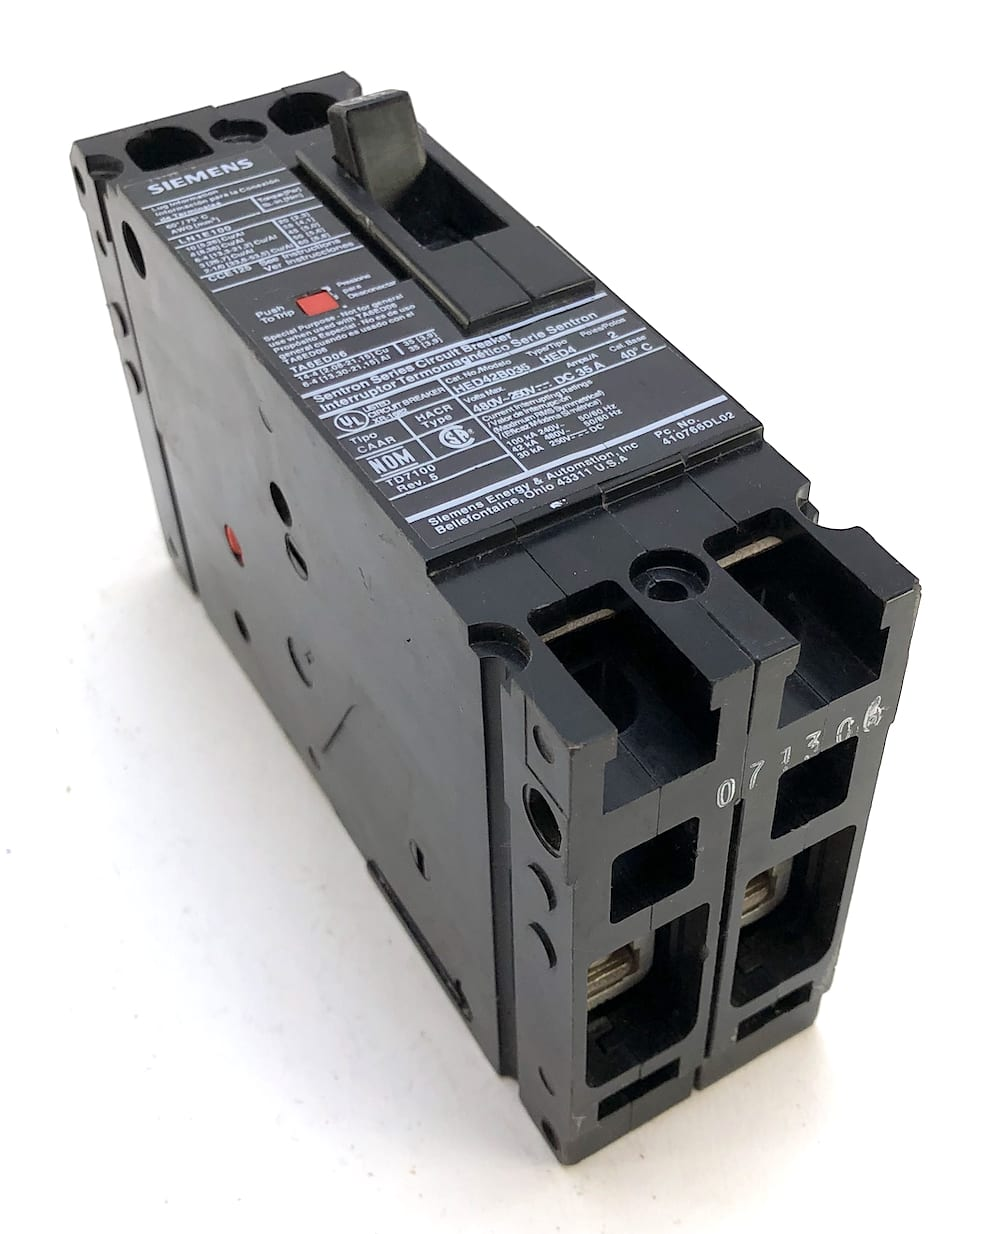 ITE Siemens HED42B035-BL